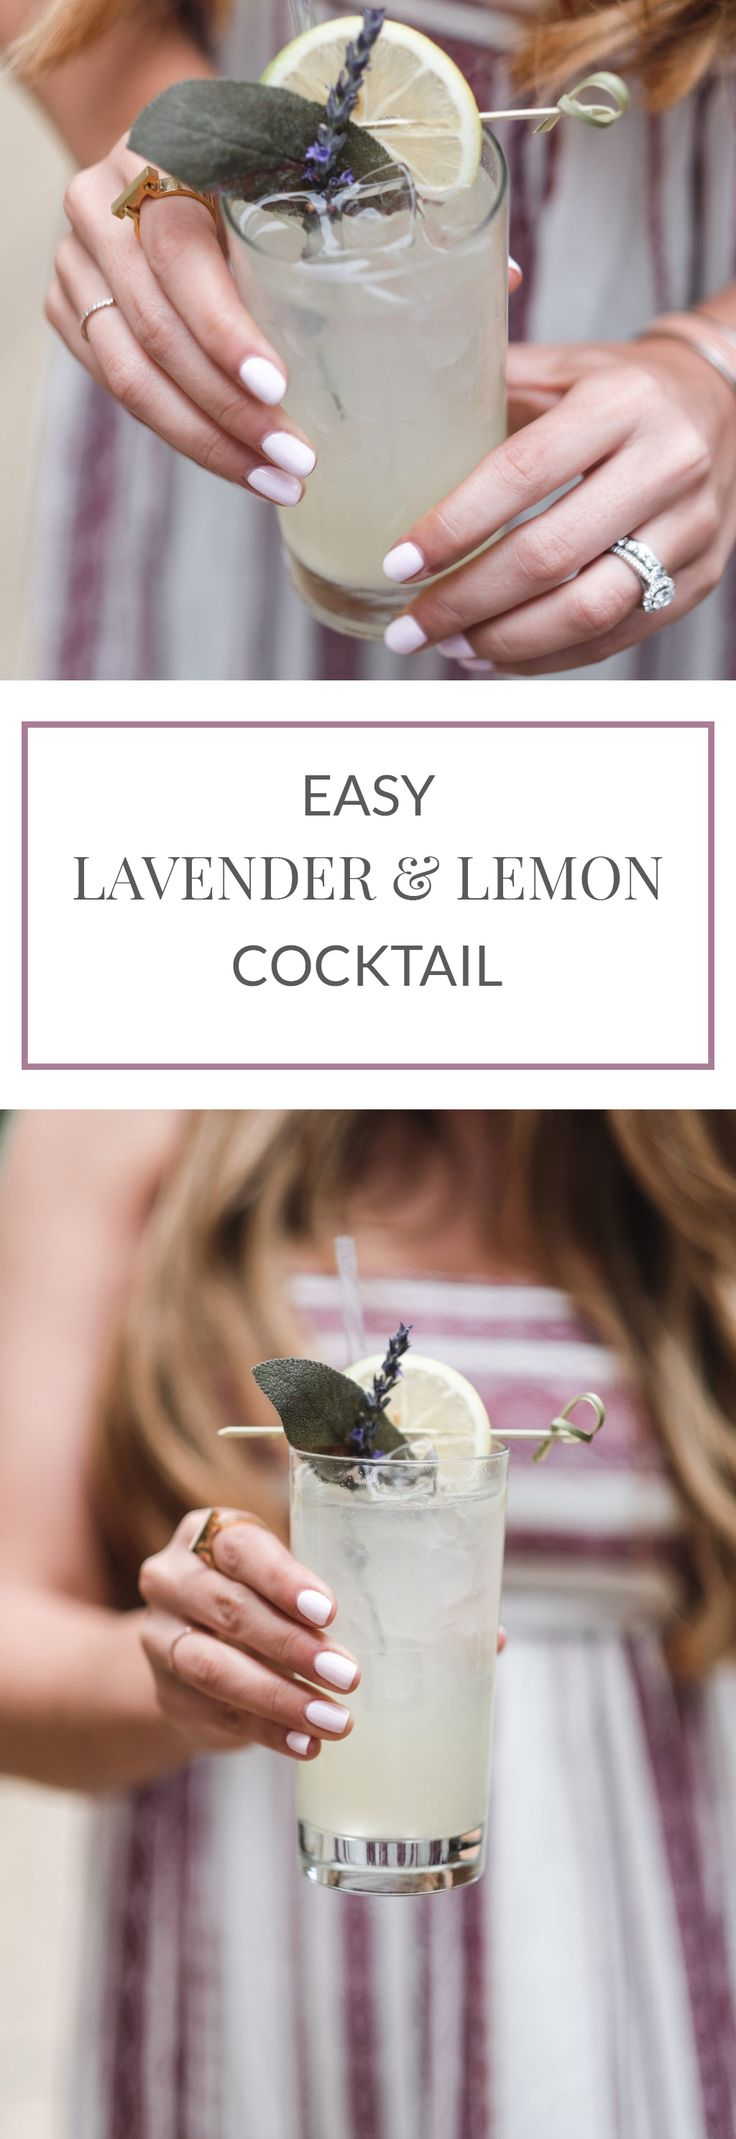 Easy Lavender Lemon Cocktail | The Teacher Diva: a Dallas Fashion Blog featuring Beauty & Lifestyle